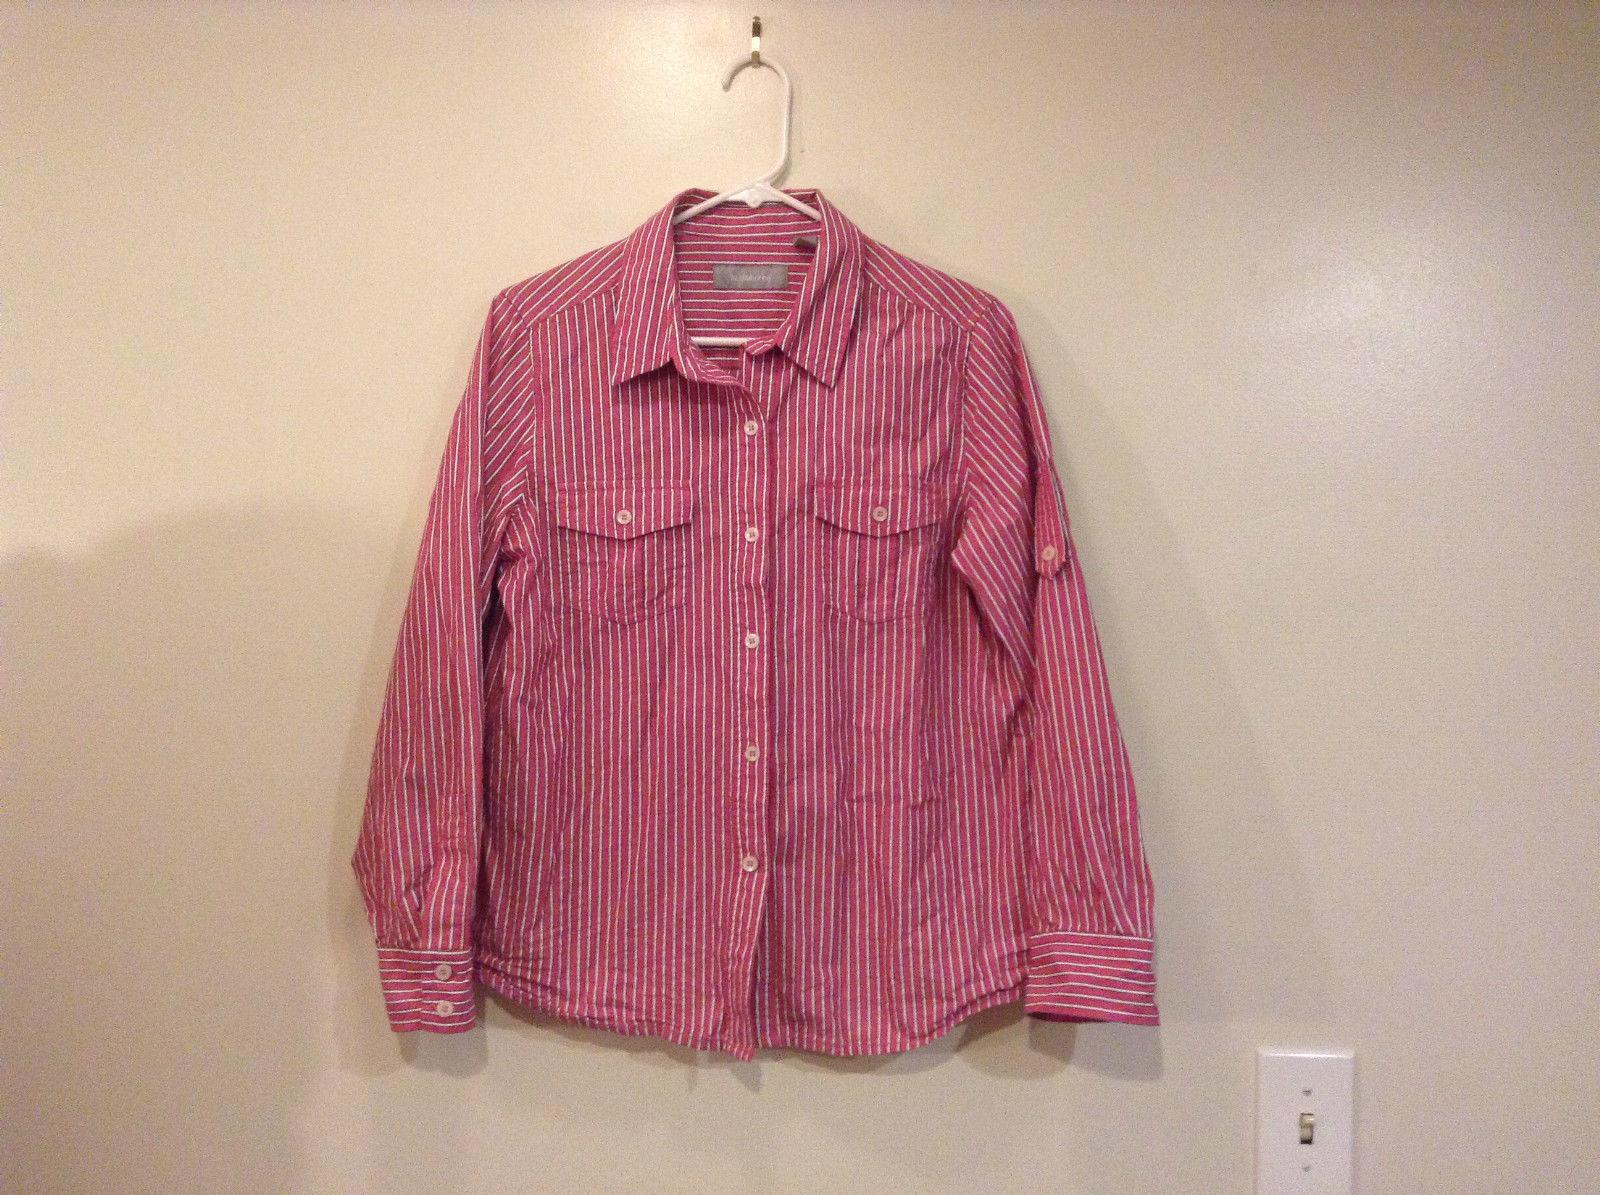 Liz Claiborne Deep Pink Button Up Front Adjustable Sleeve Length Shirt Size L